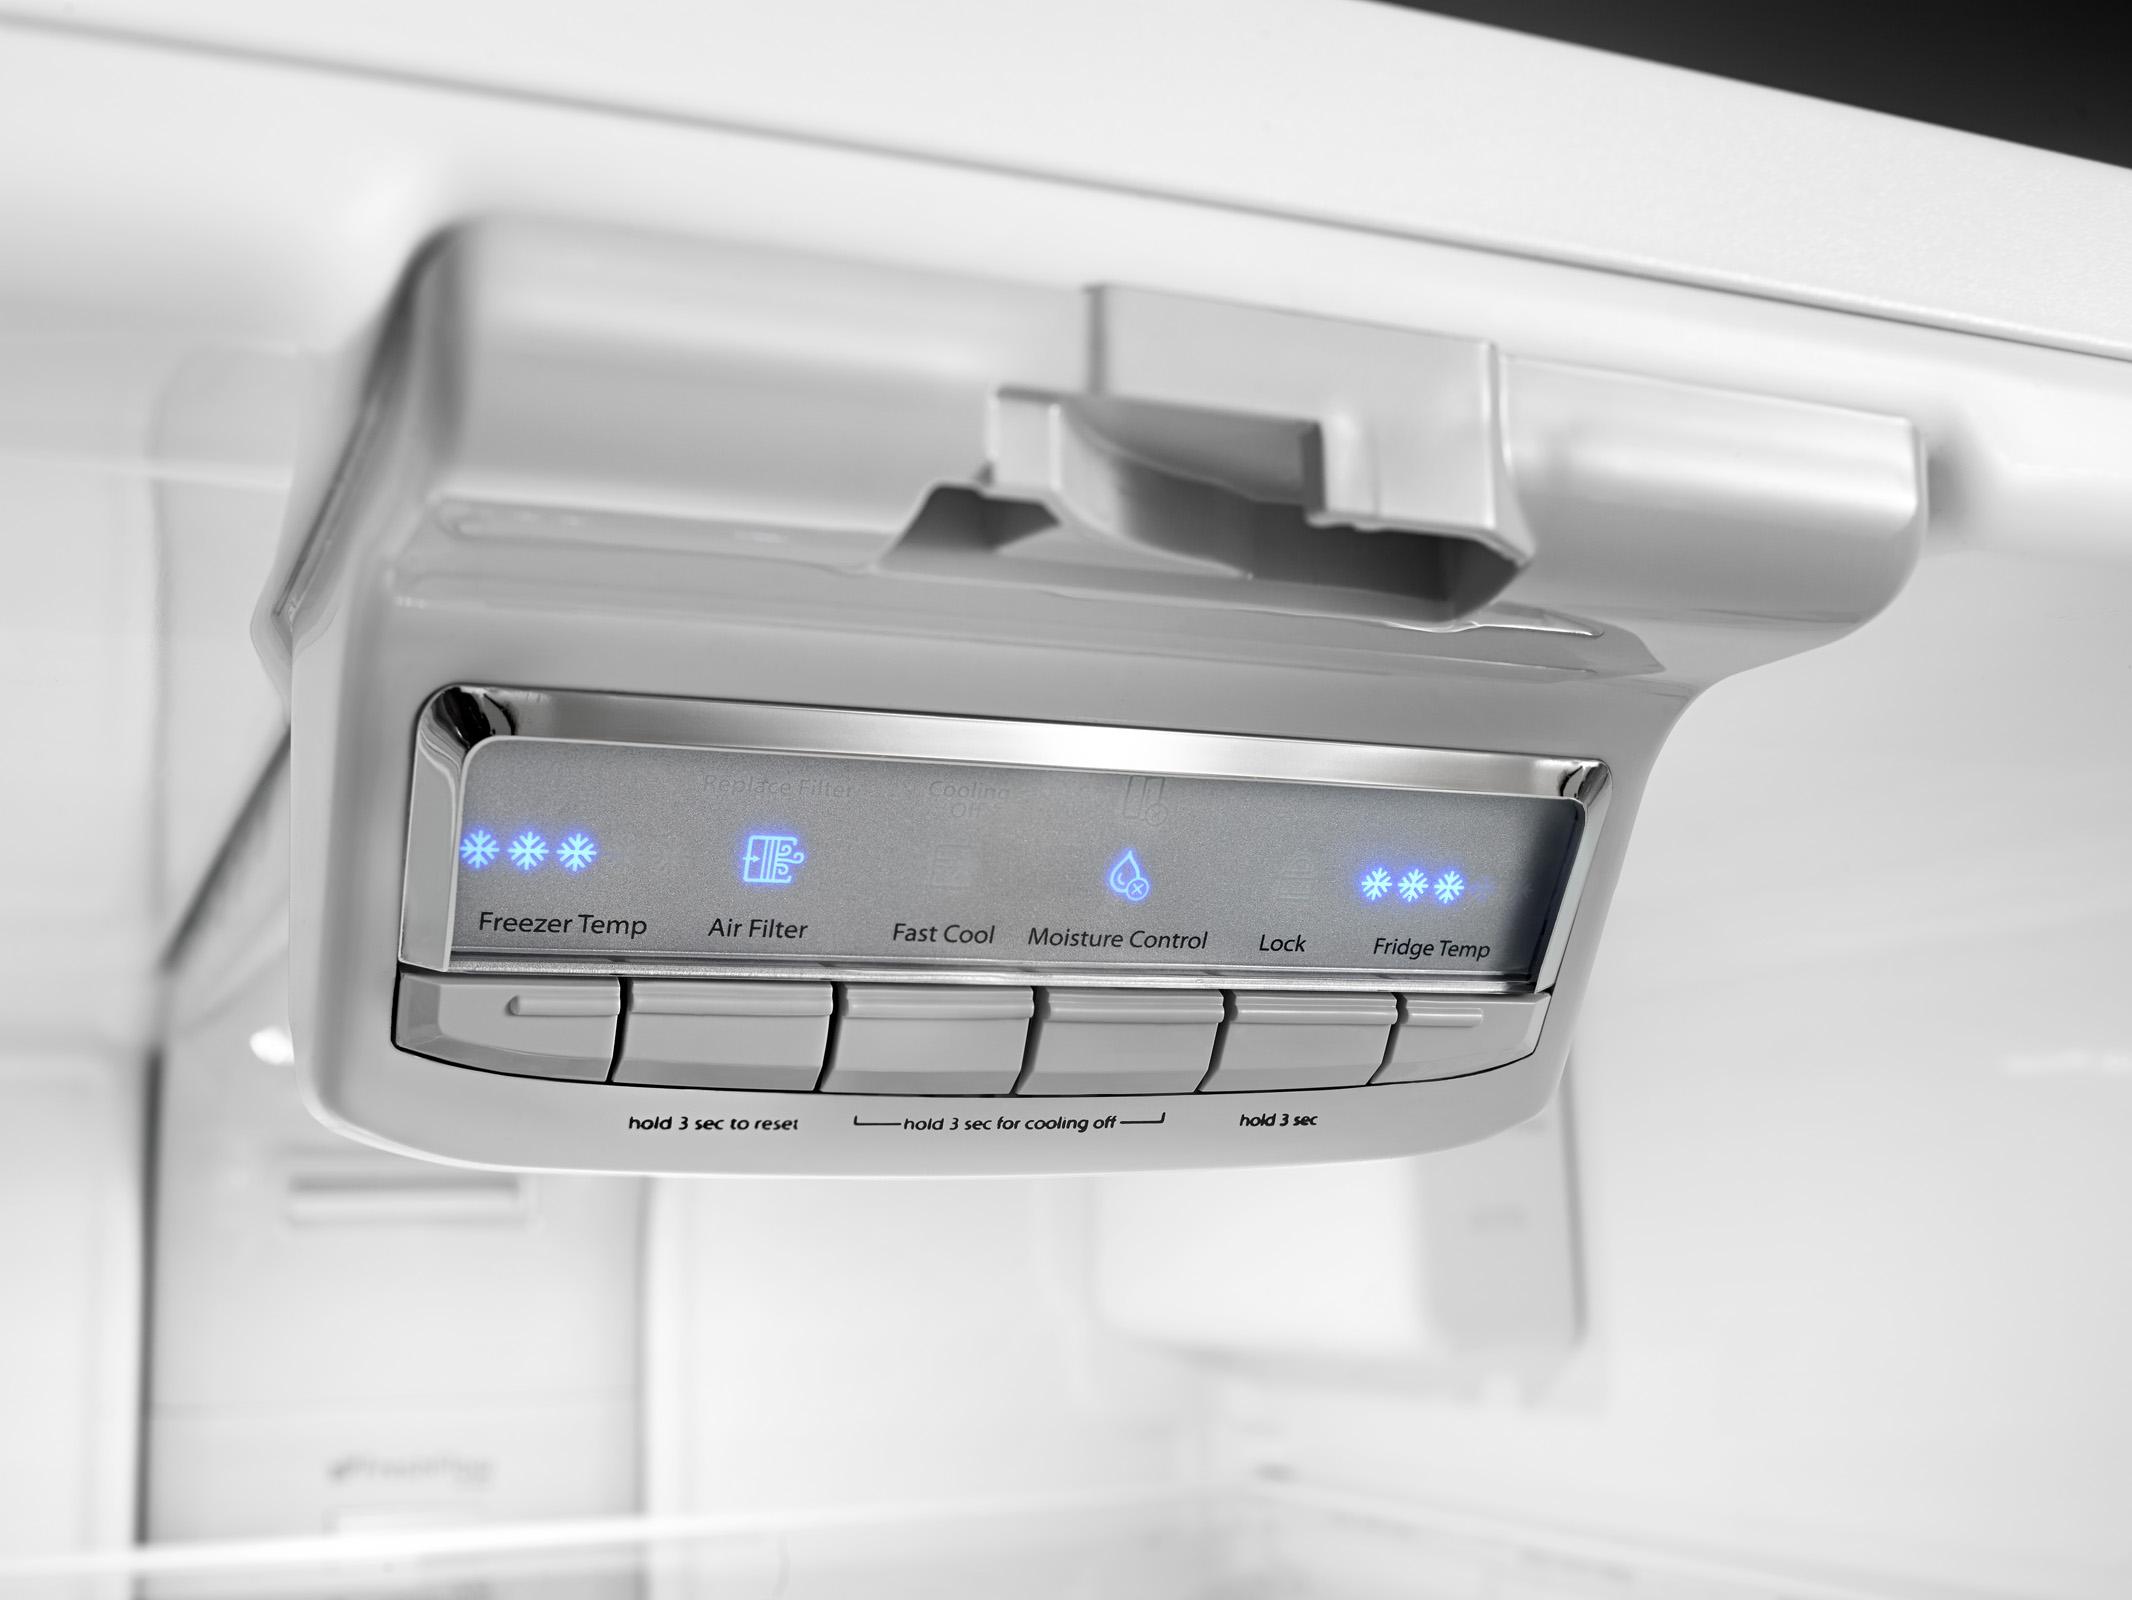 Kenmore 73003 19.5 cu. ft. Bottom Freezer Refrigerator - Stainless Steel